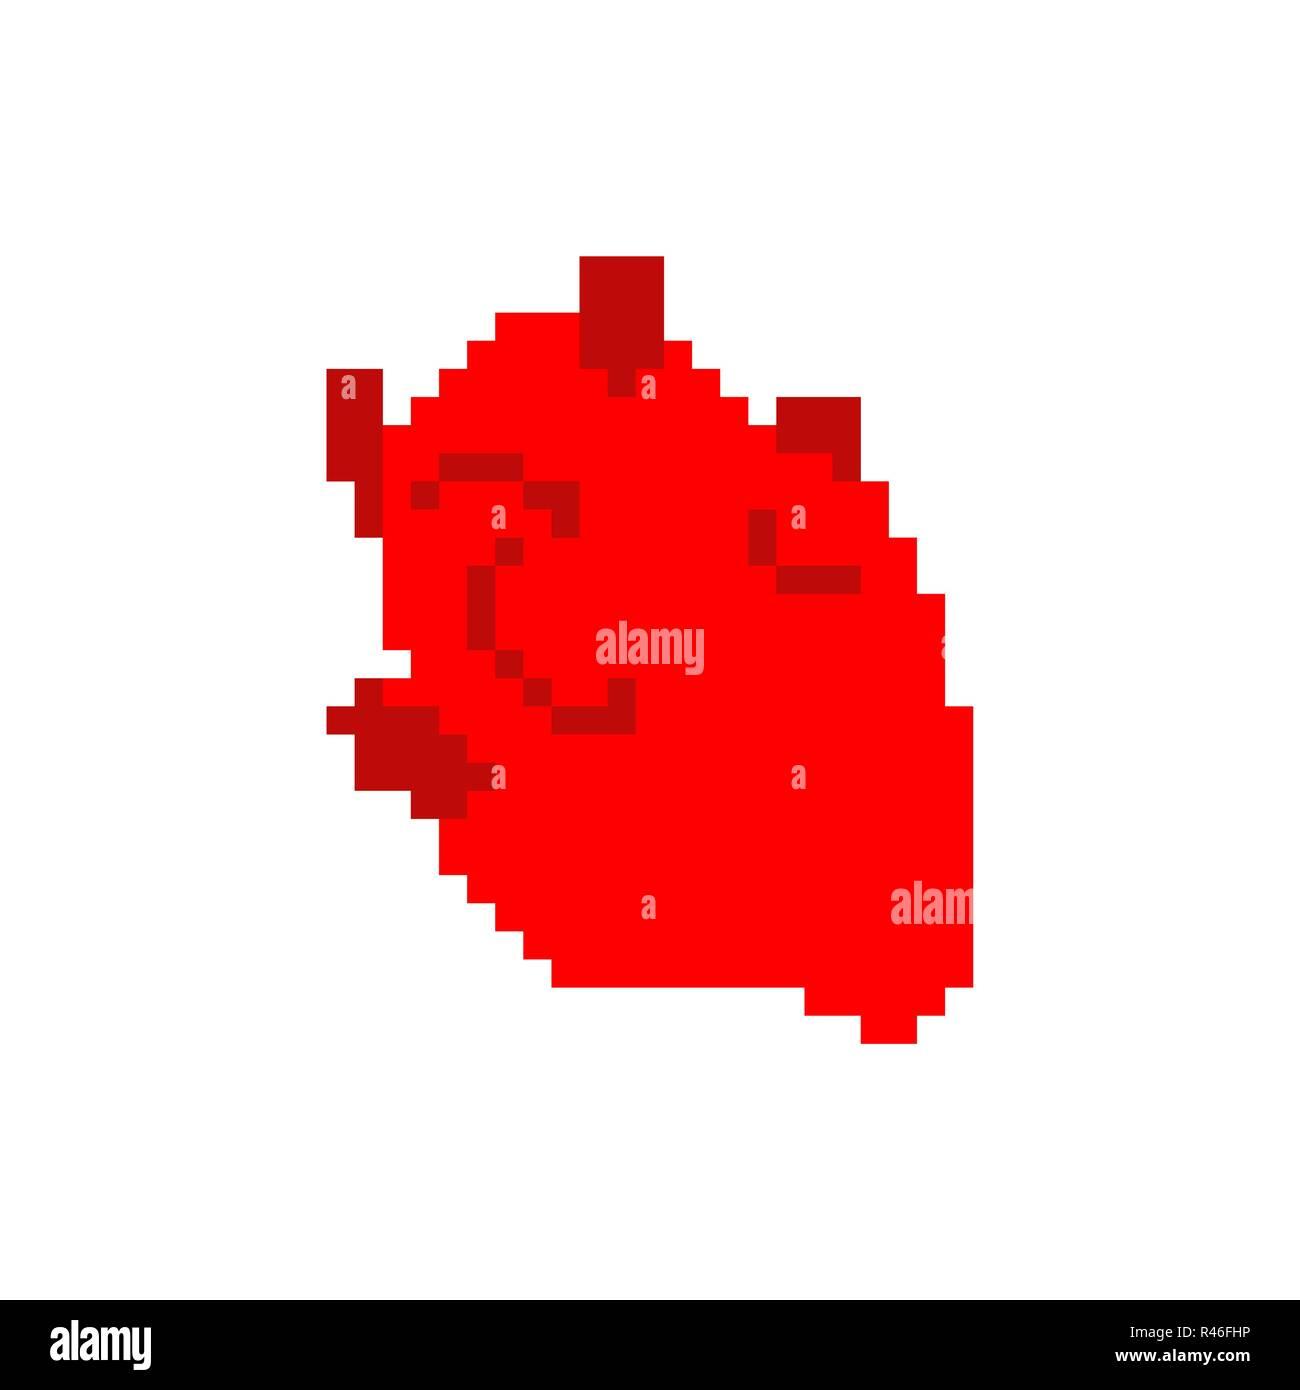 Heart Anatomy Pixel Art Human Internal Organs 8 Bit Pixelate 16bit